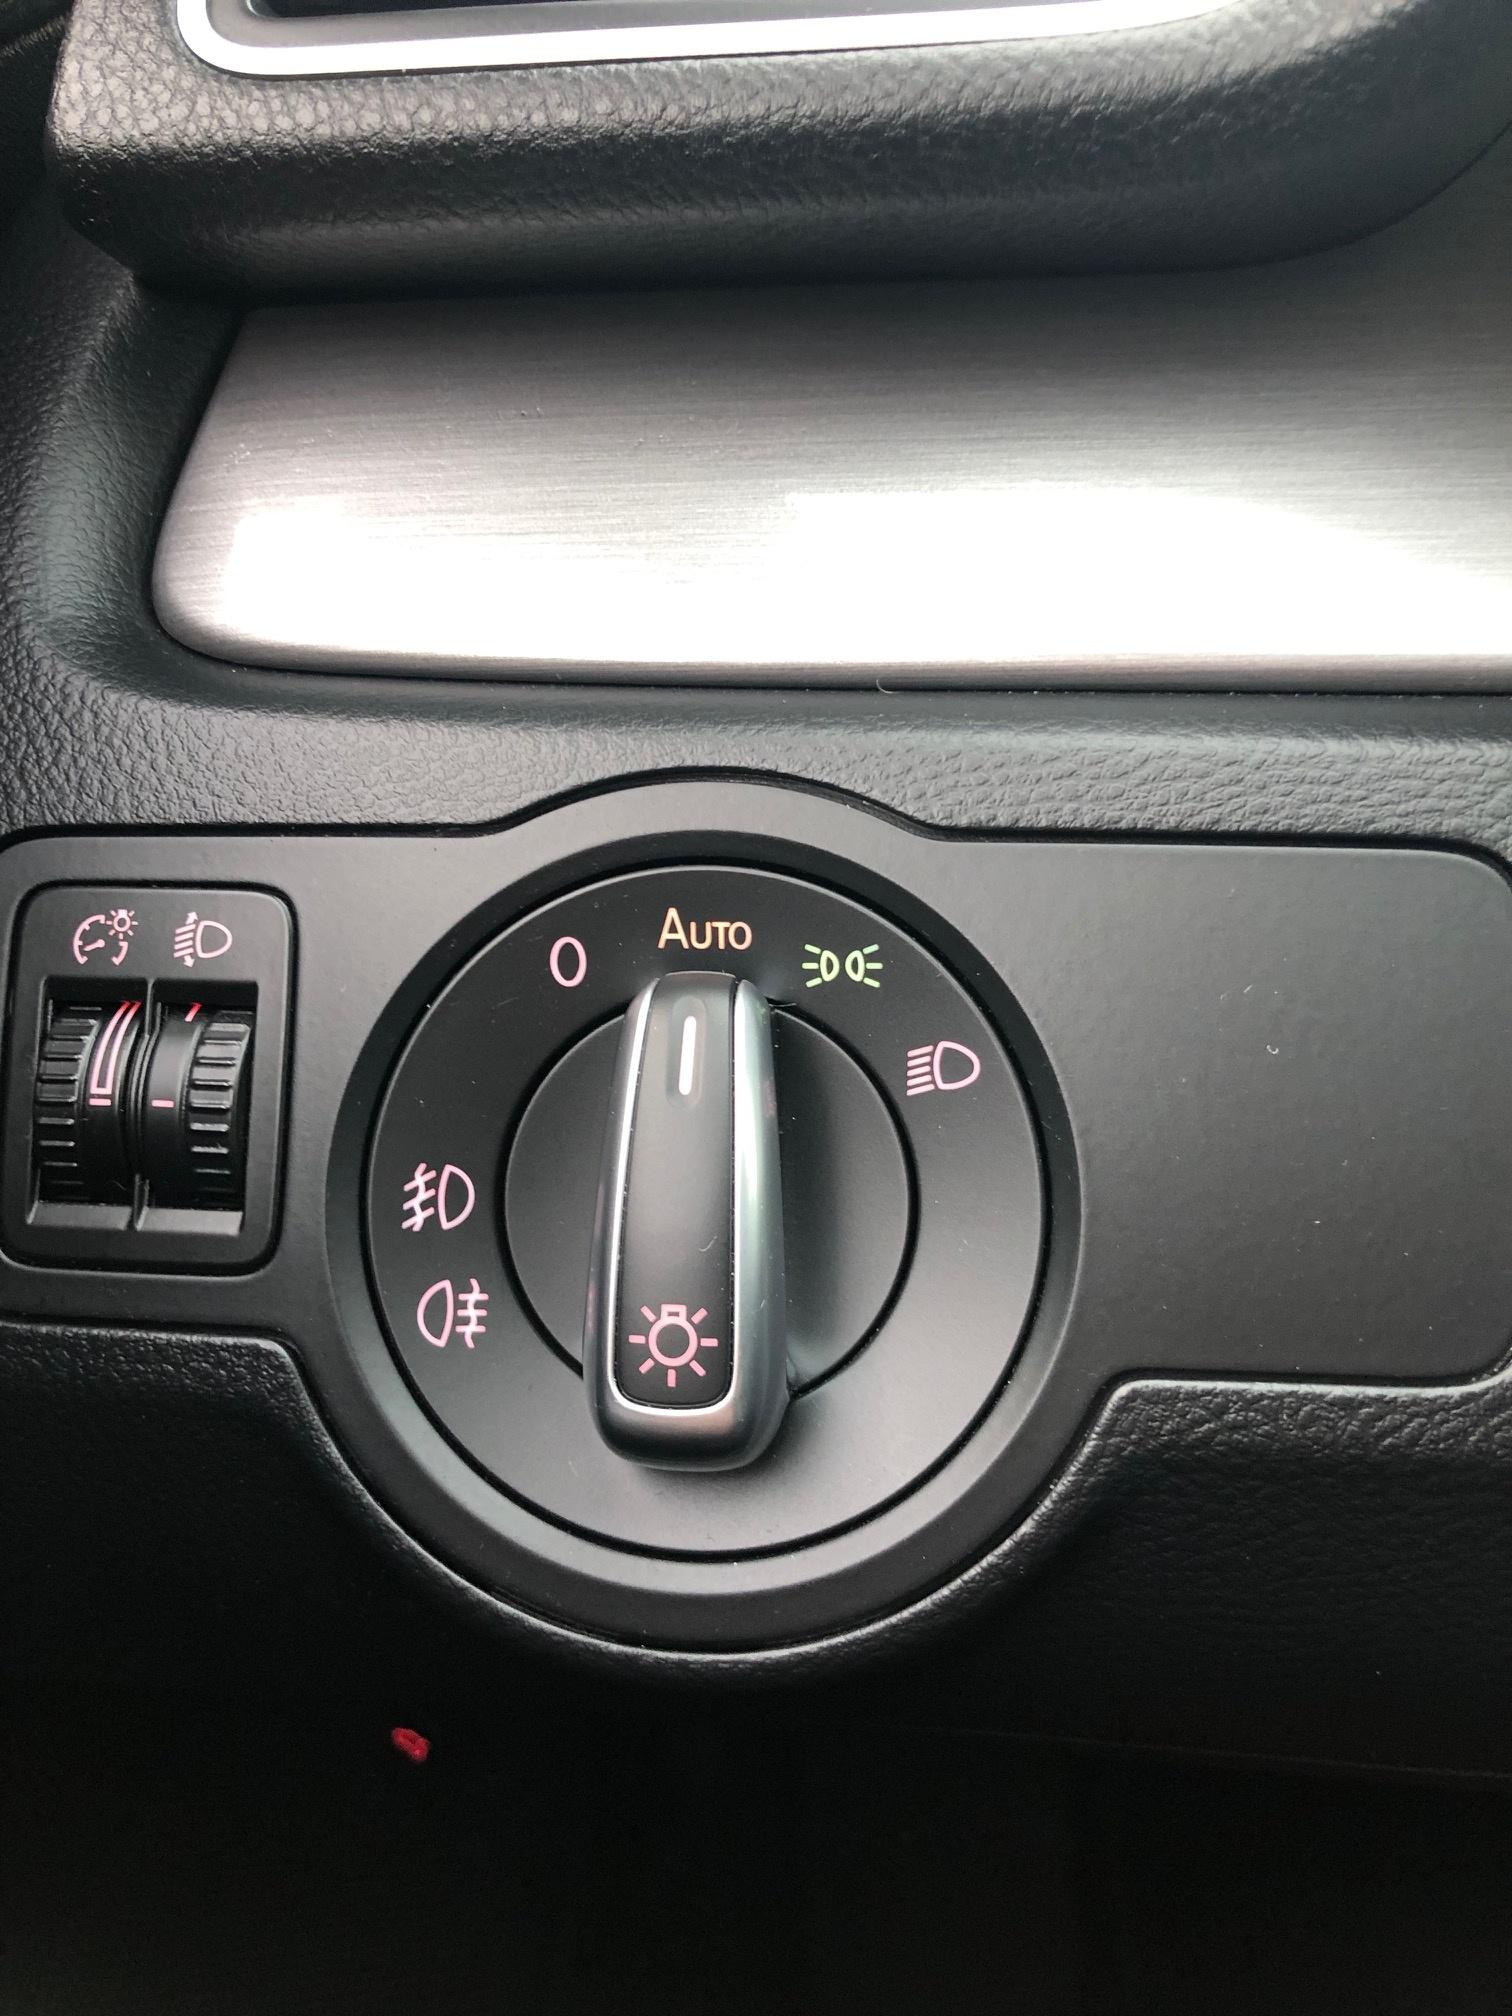 VW PASSAT 2.0 TDI DSG CONFORTLINE - Provjerena rabljena vozila!